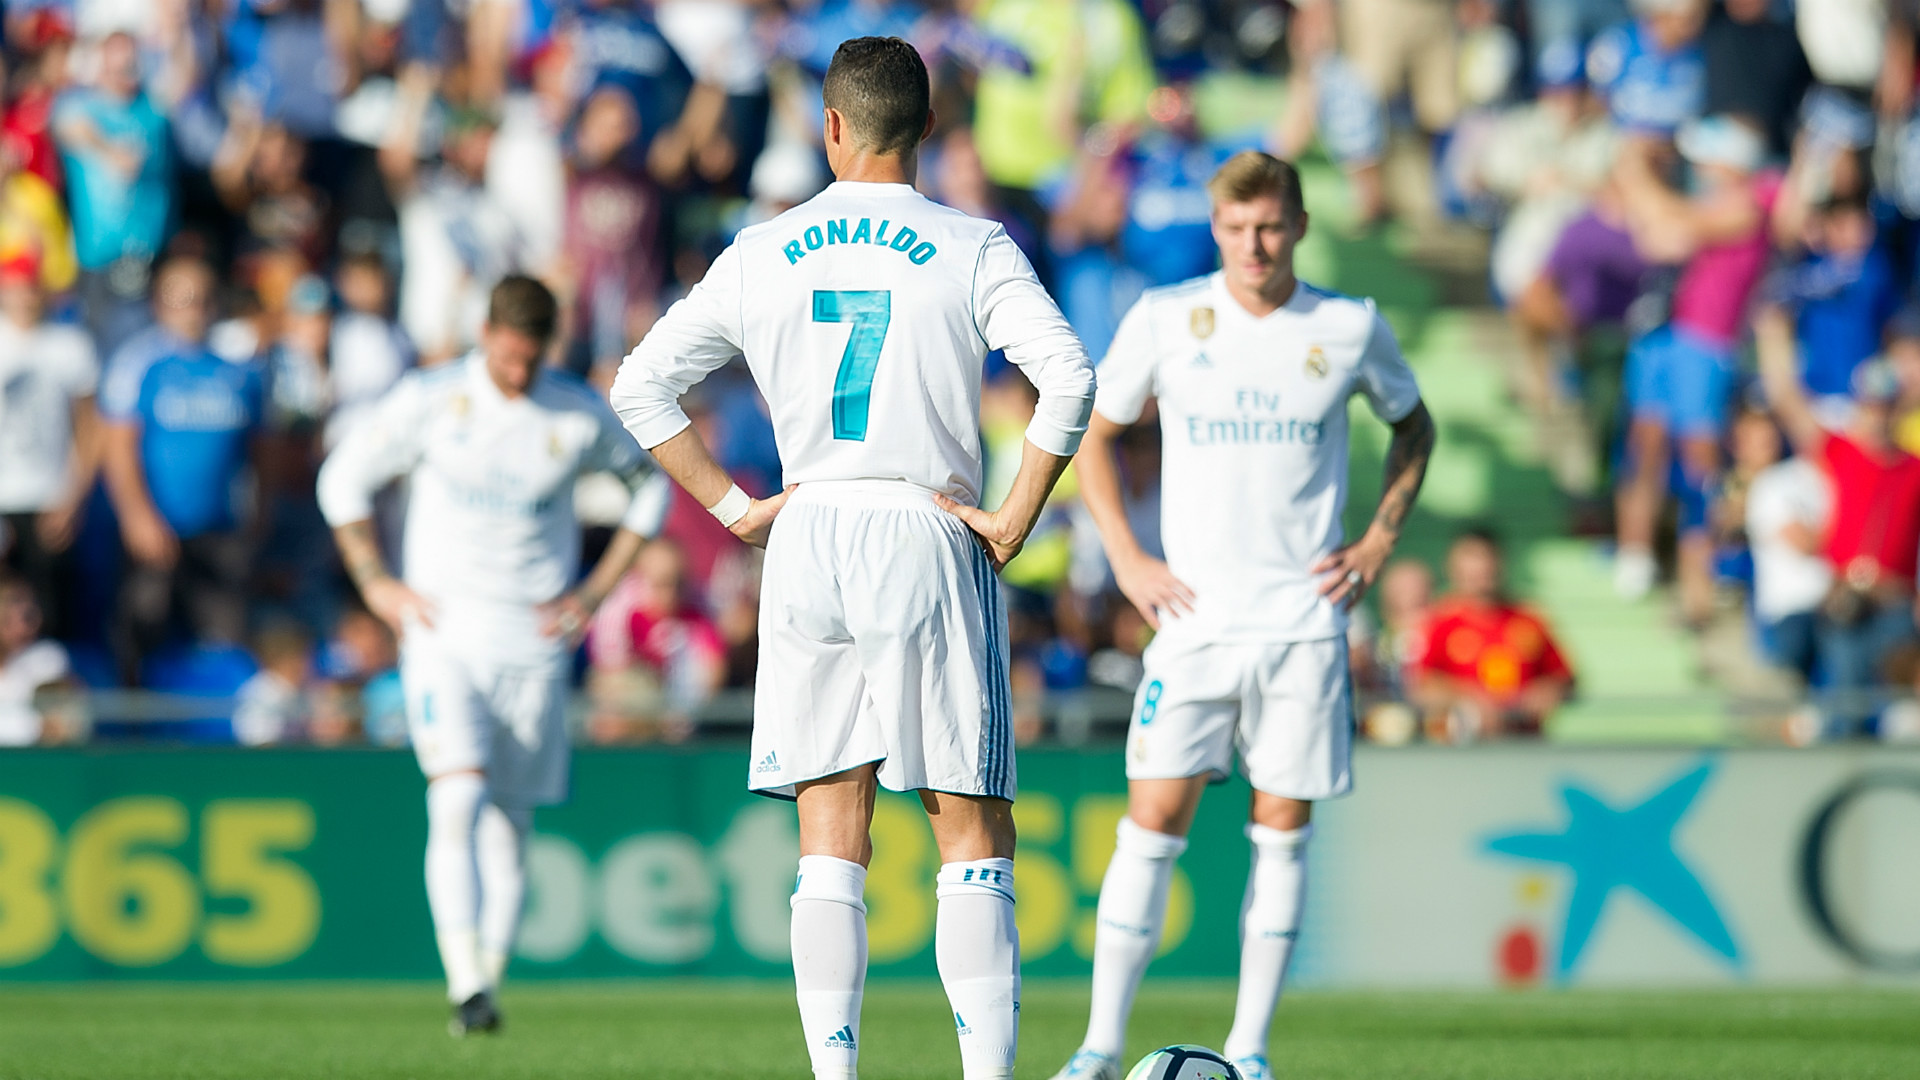 Ronaldo Getafe Real Madrid LaLiga